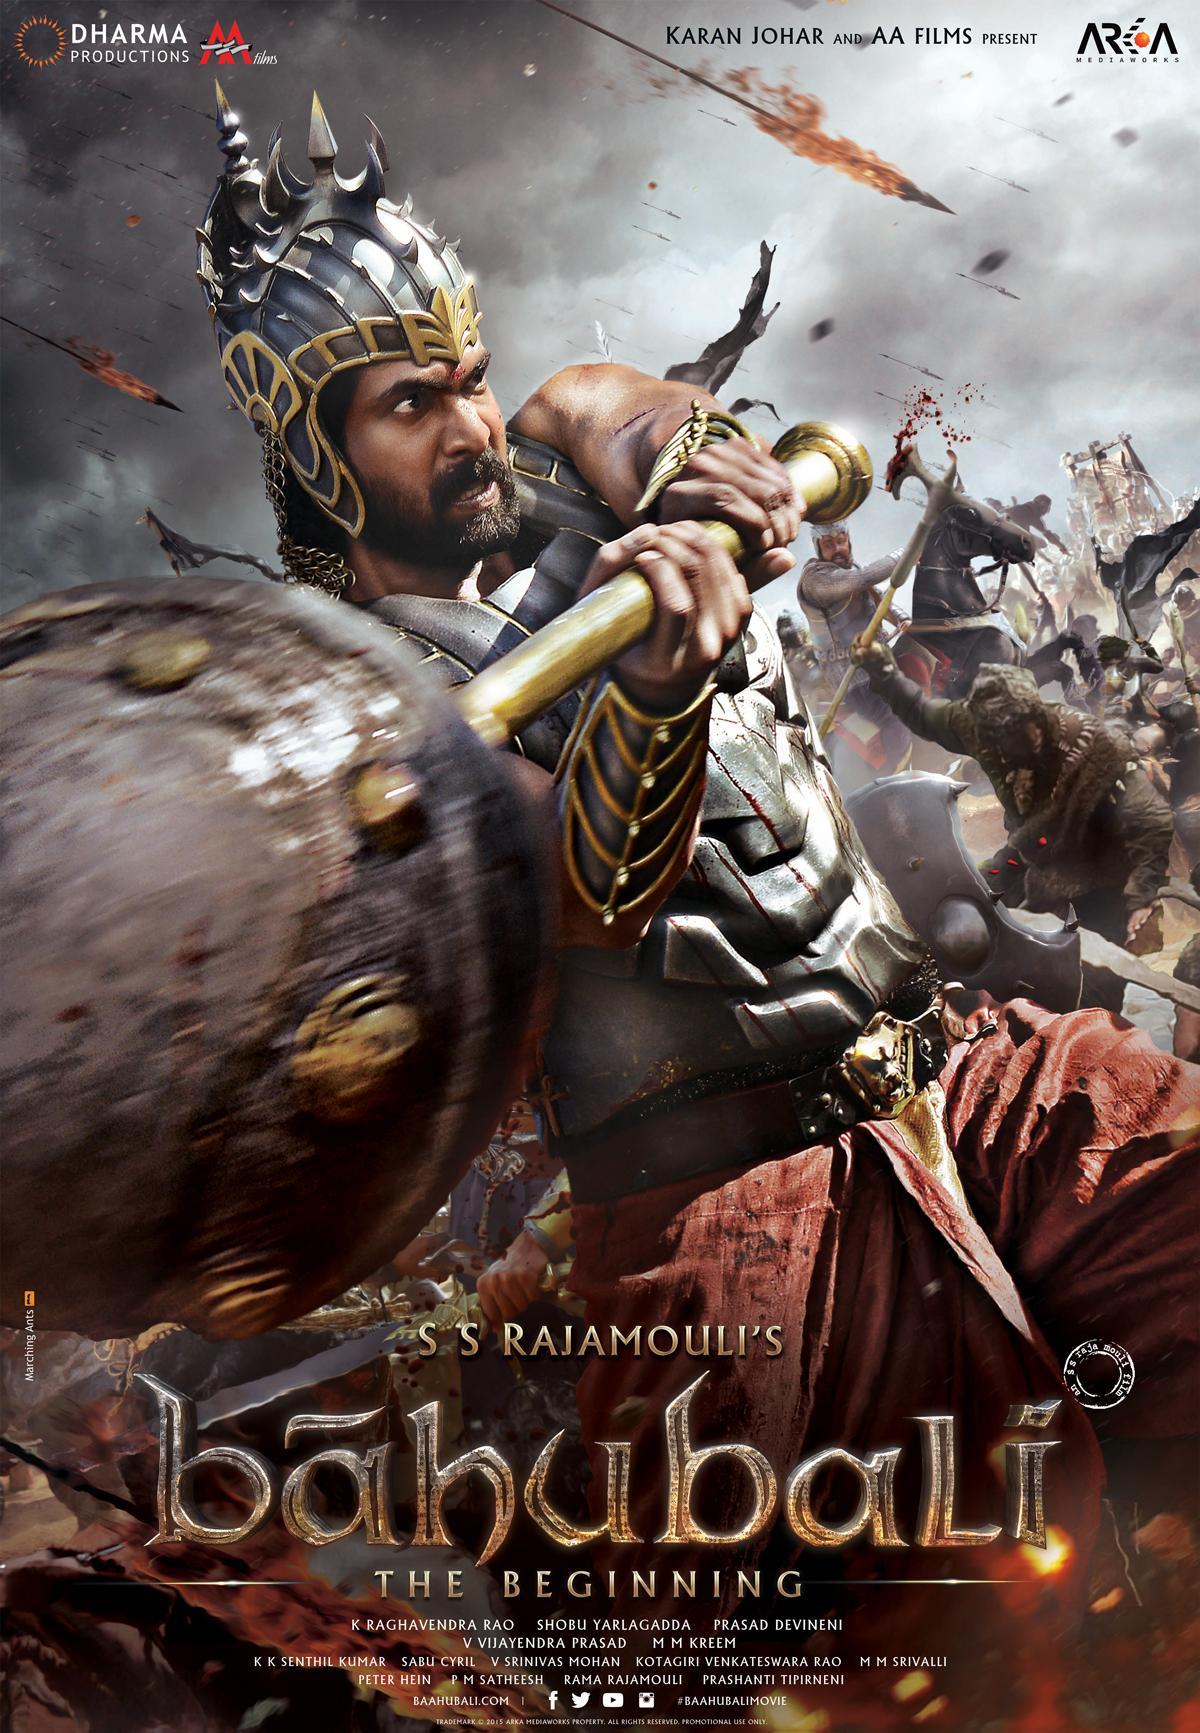 bahubali poster 1 on behance